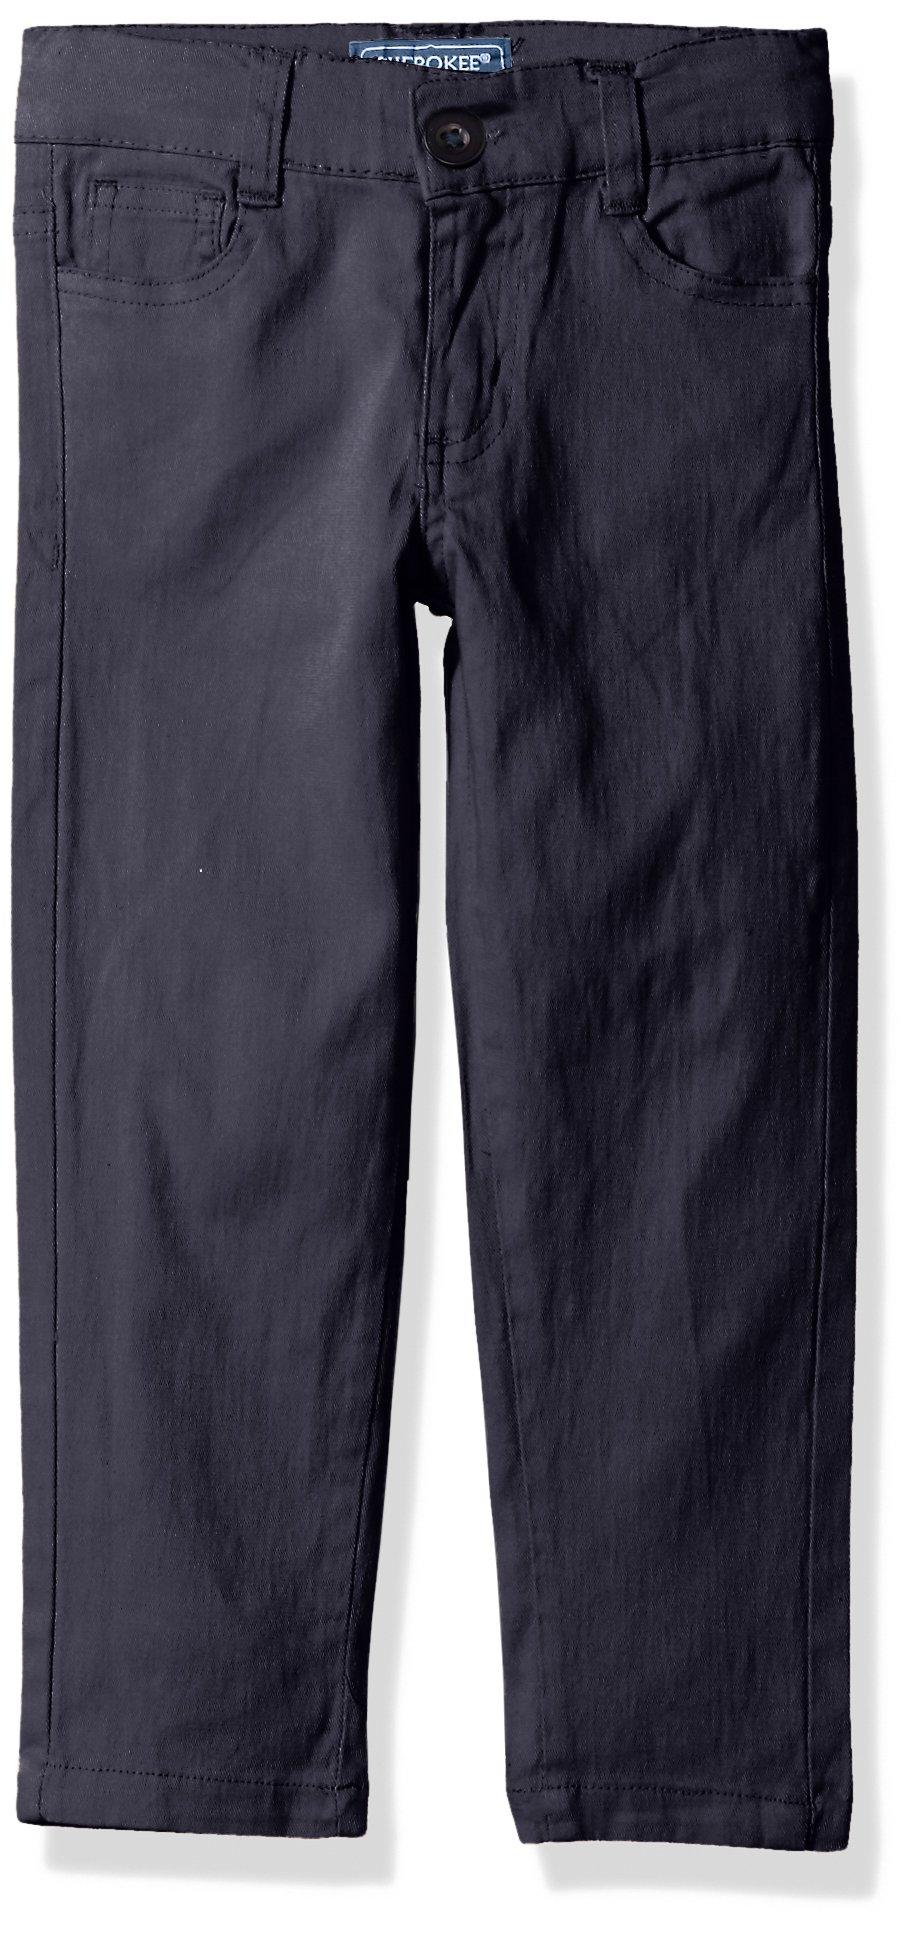 Cherokee Big Girls' Uniform Stretch Twill Skinny Pant, Navy 5 Pocket, 12